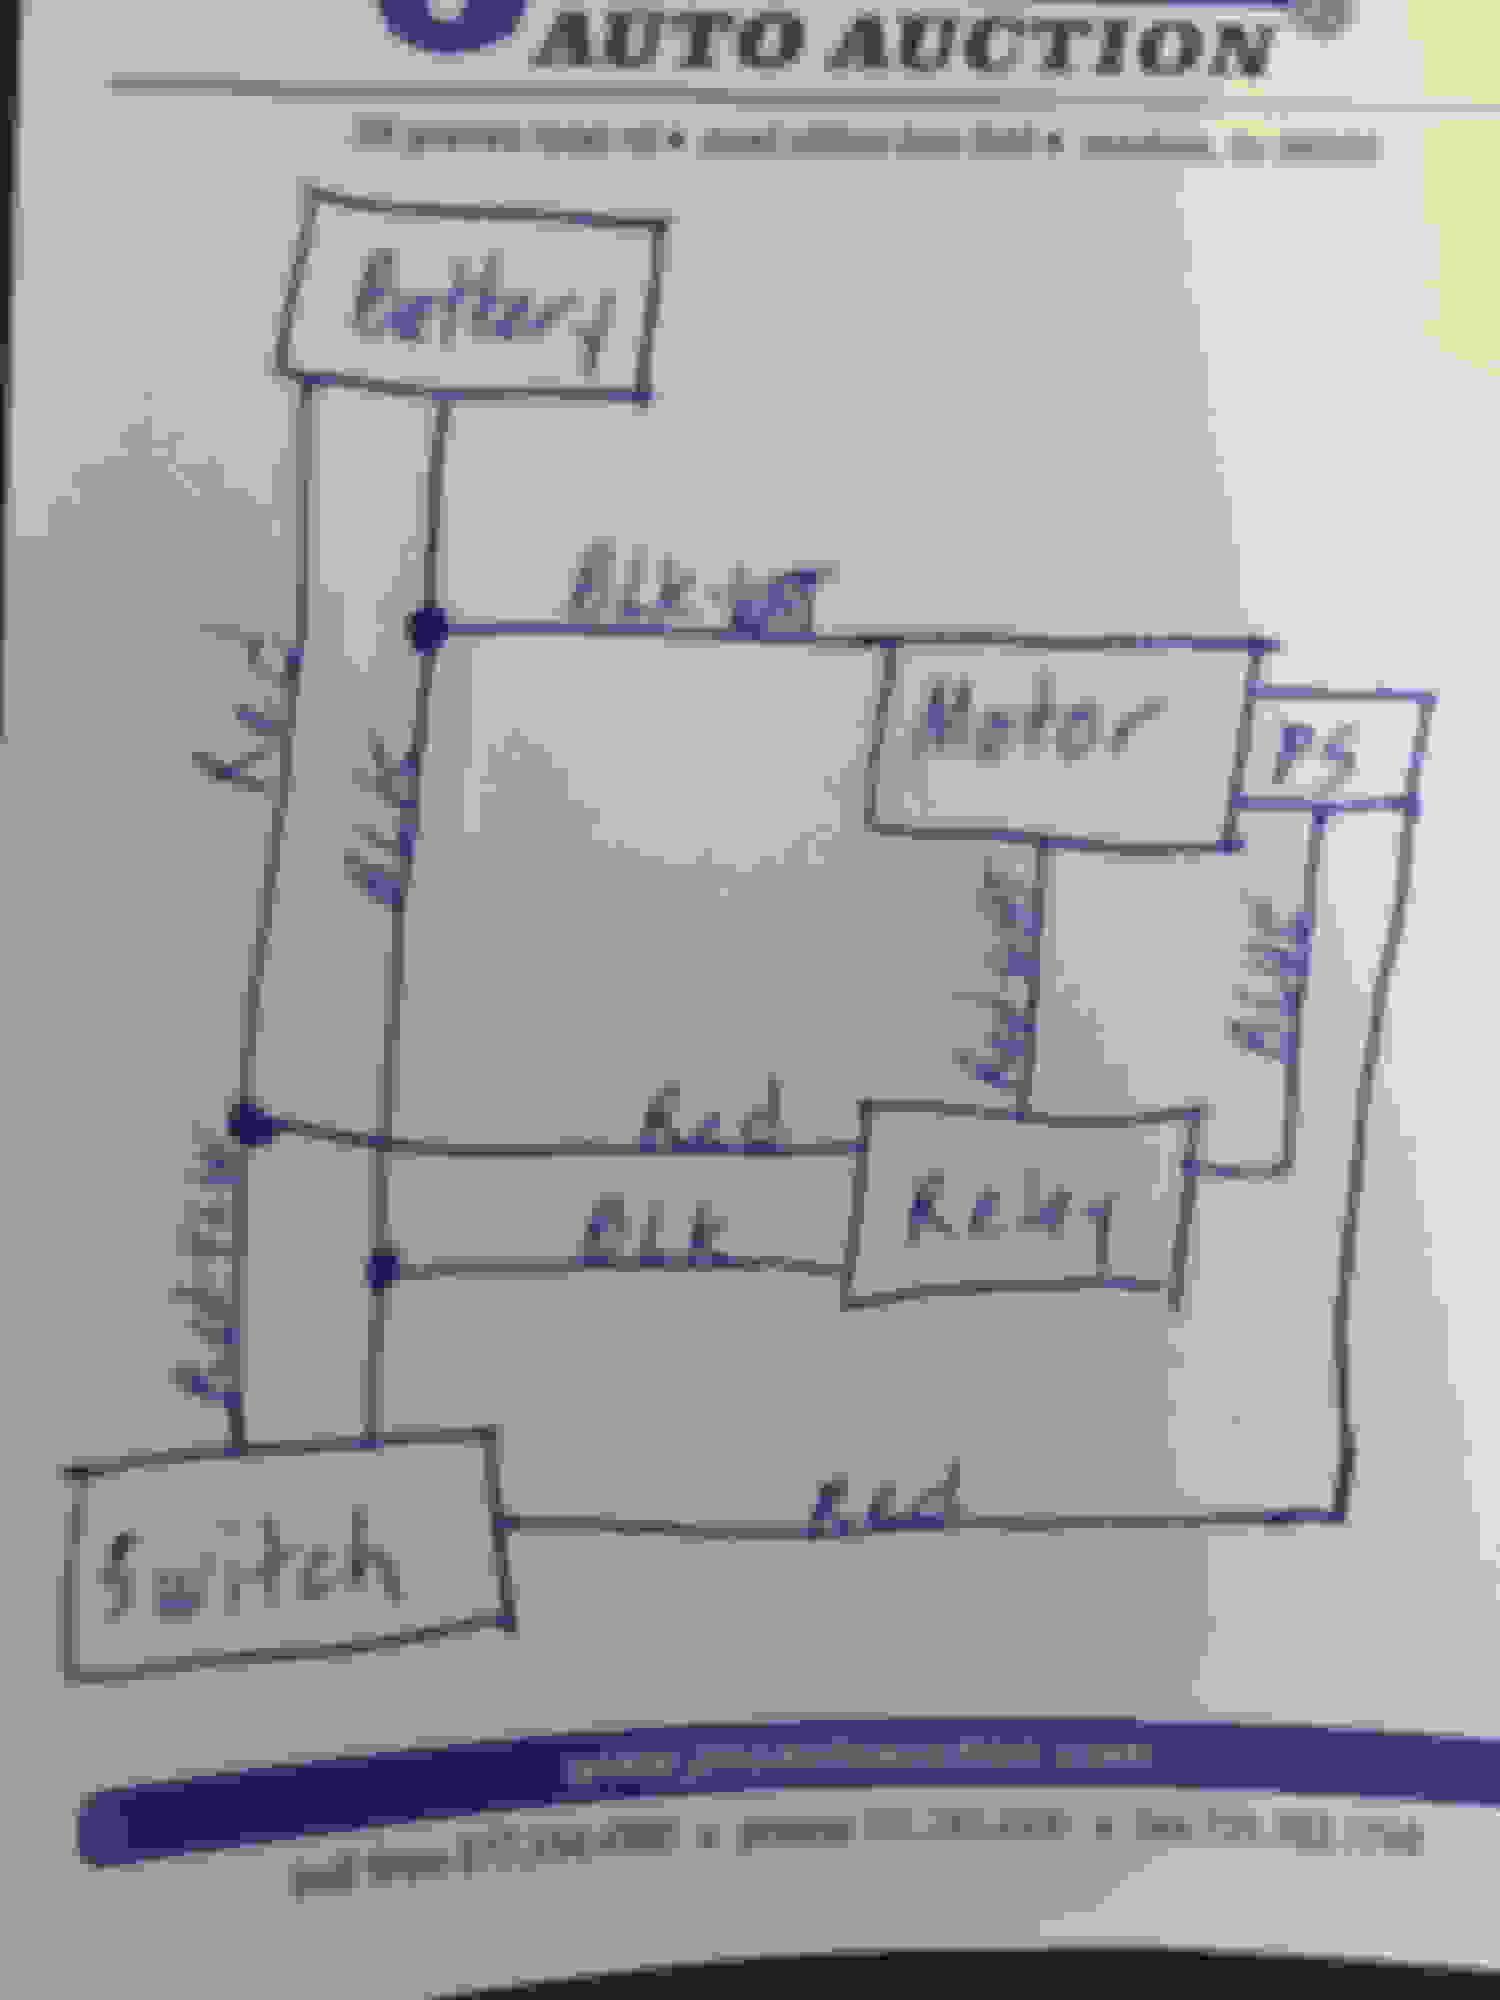 Arb Air Locker Wiring Diagram